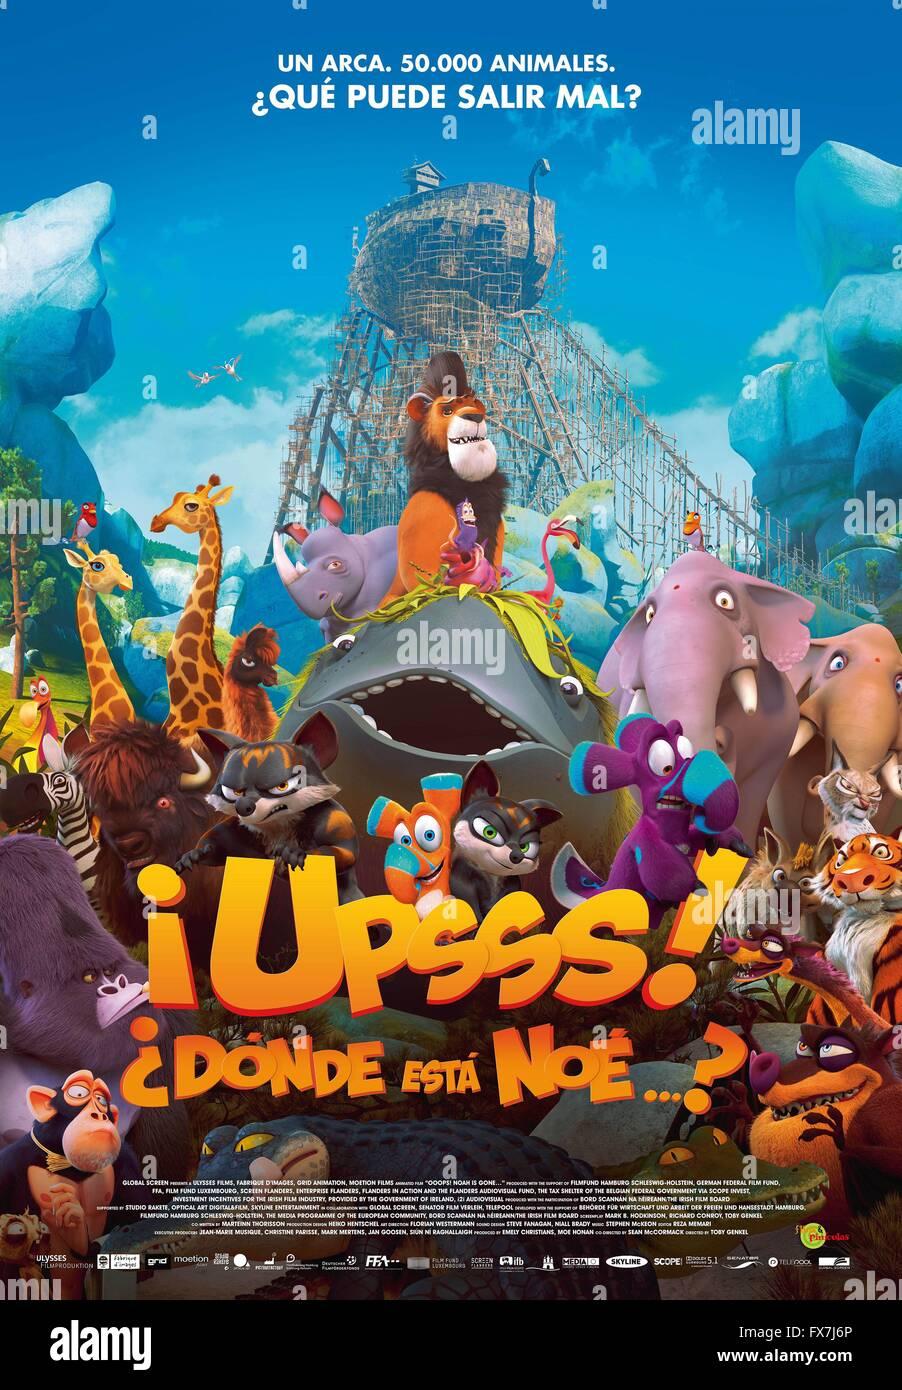 Year 2015 Germany Belgium Director Toby Genkel Sean McCormack Animation Movie Poster Esp